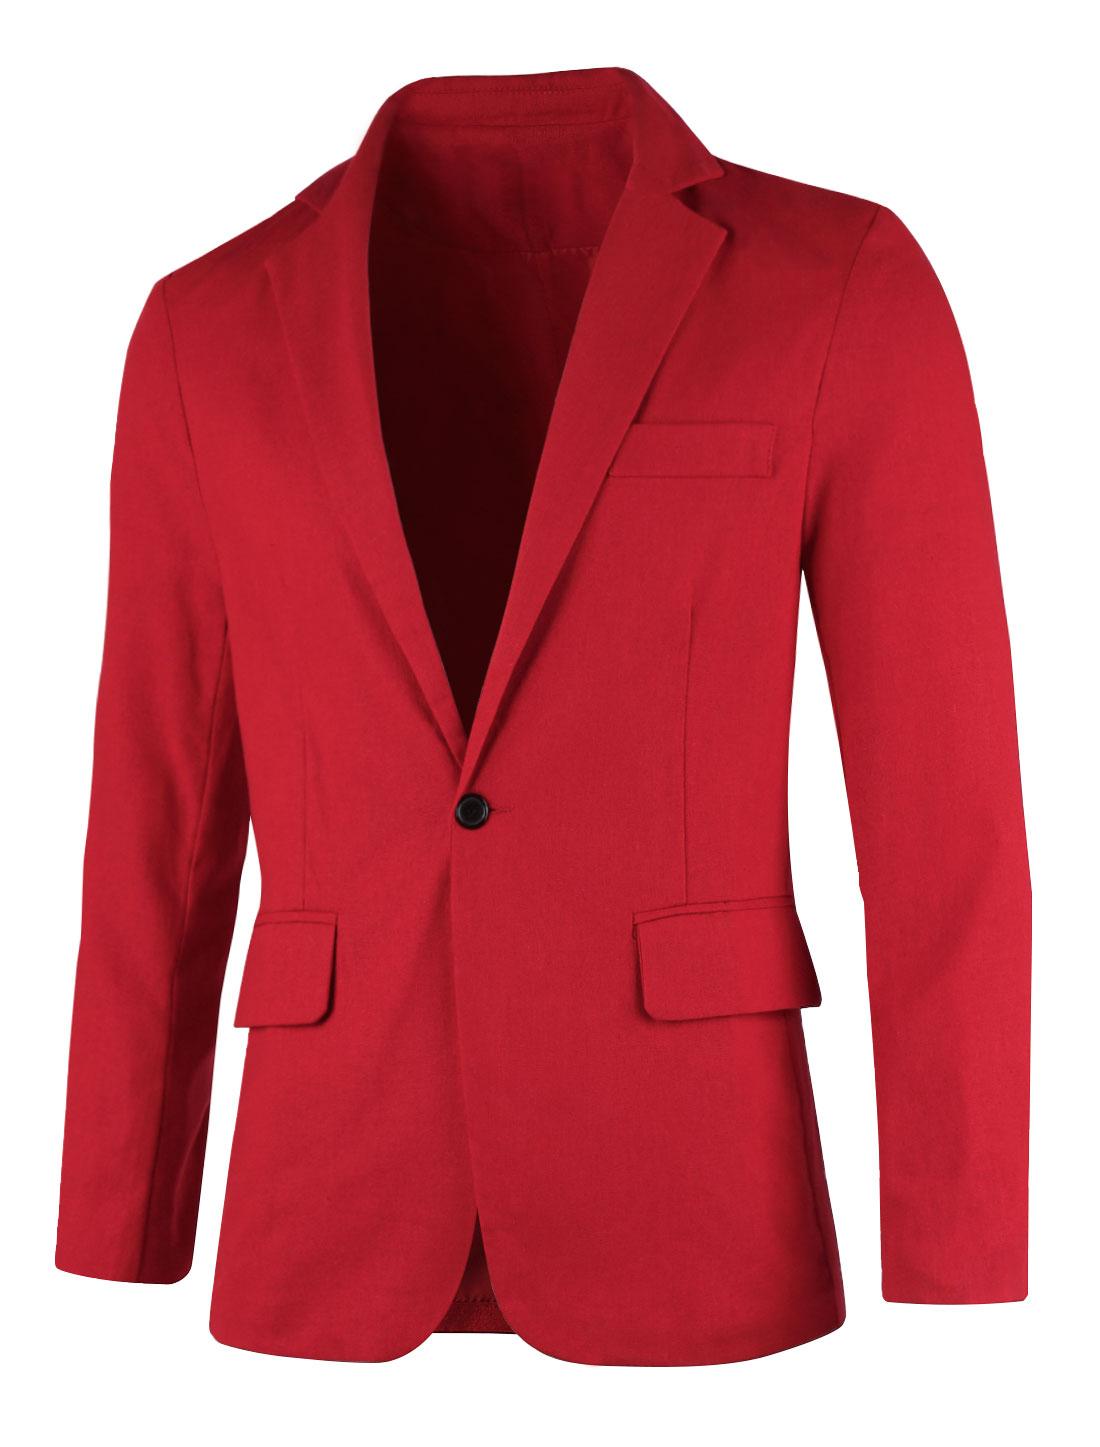 Men Long Sleeve Button Down Pockets Slim Fit Leisure Blazer Jacket M